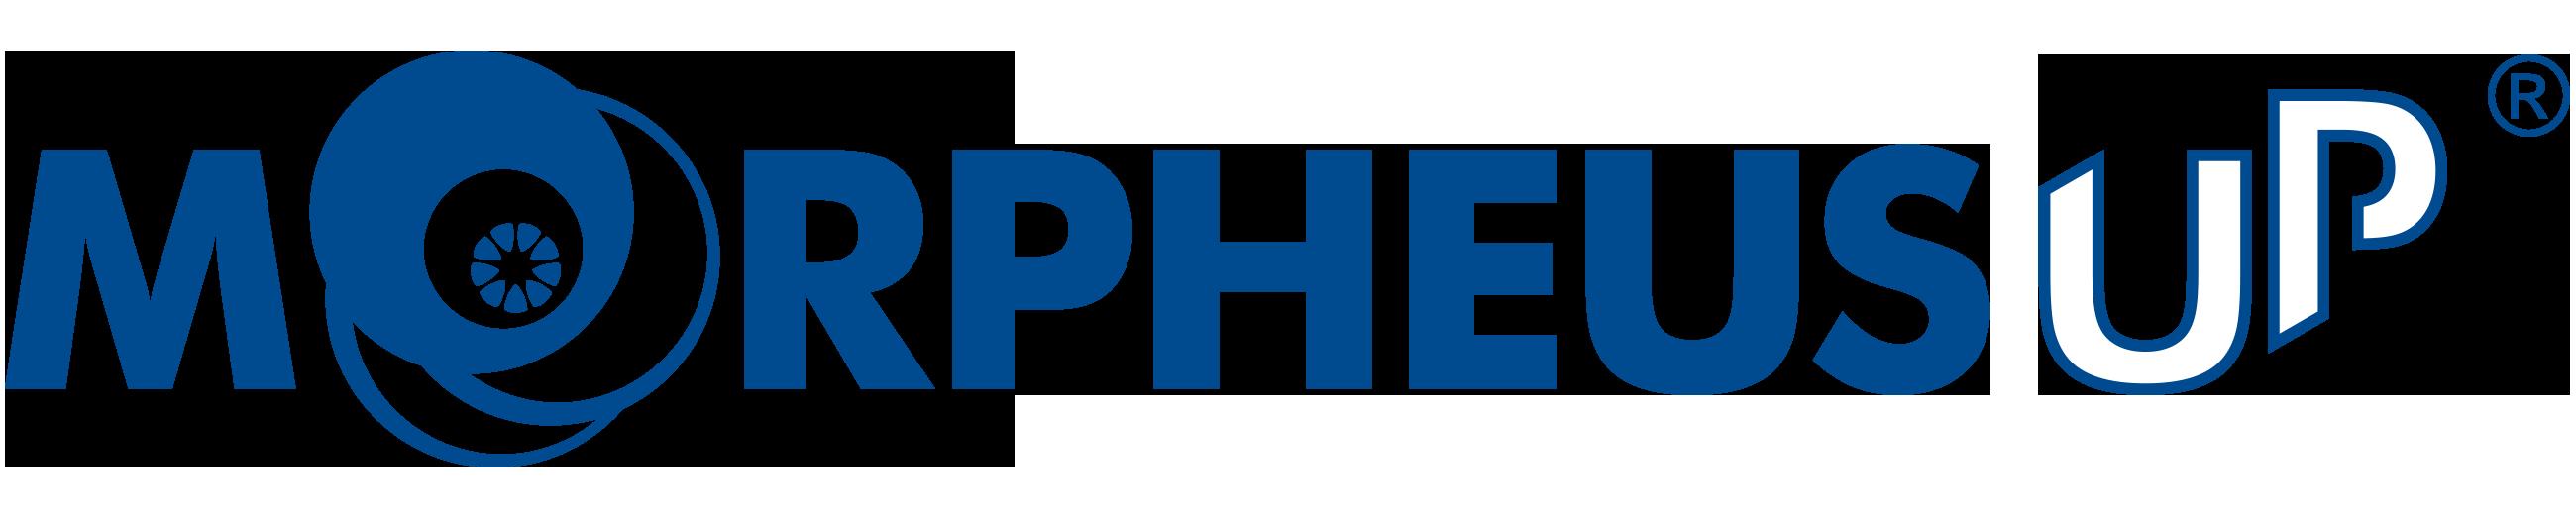 logo_morpheus_up_2600 (1)